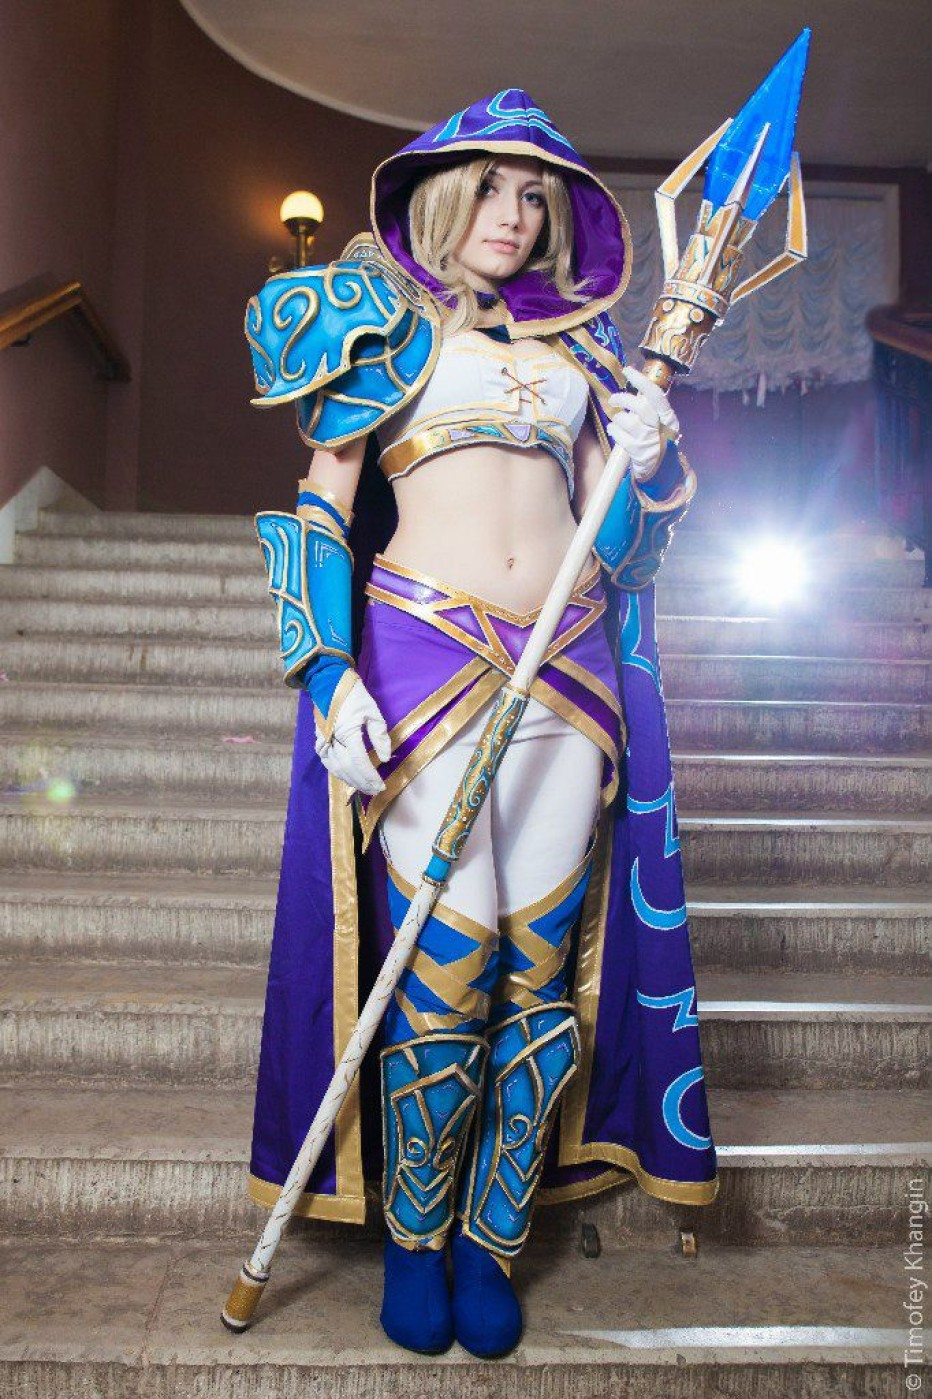 Warcraft-III-Jaina-Proudmoore-Narga-Cosplay-Gamers-Heroes-16.jpg